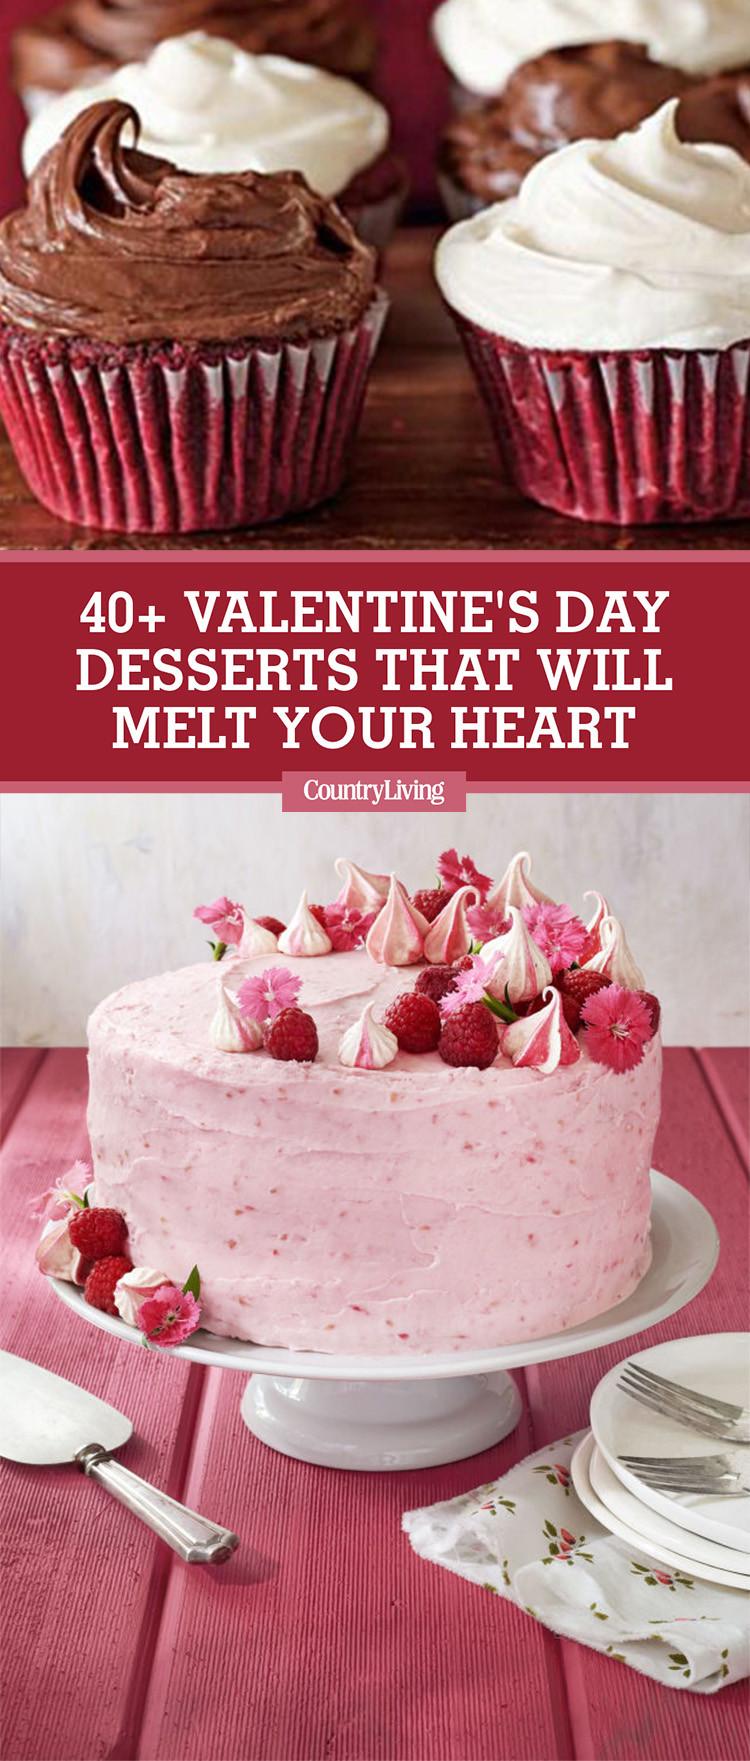 Valentine Day Recipes Dessert  42 Easy Valentine's Day Desserts Best Recipes for